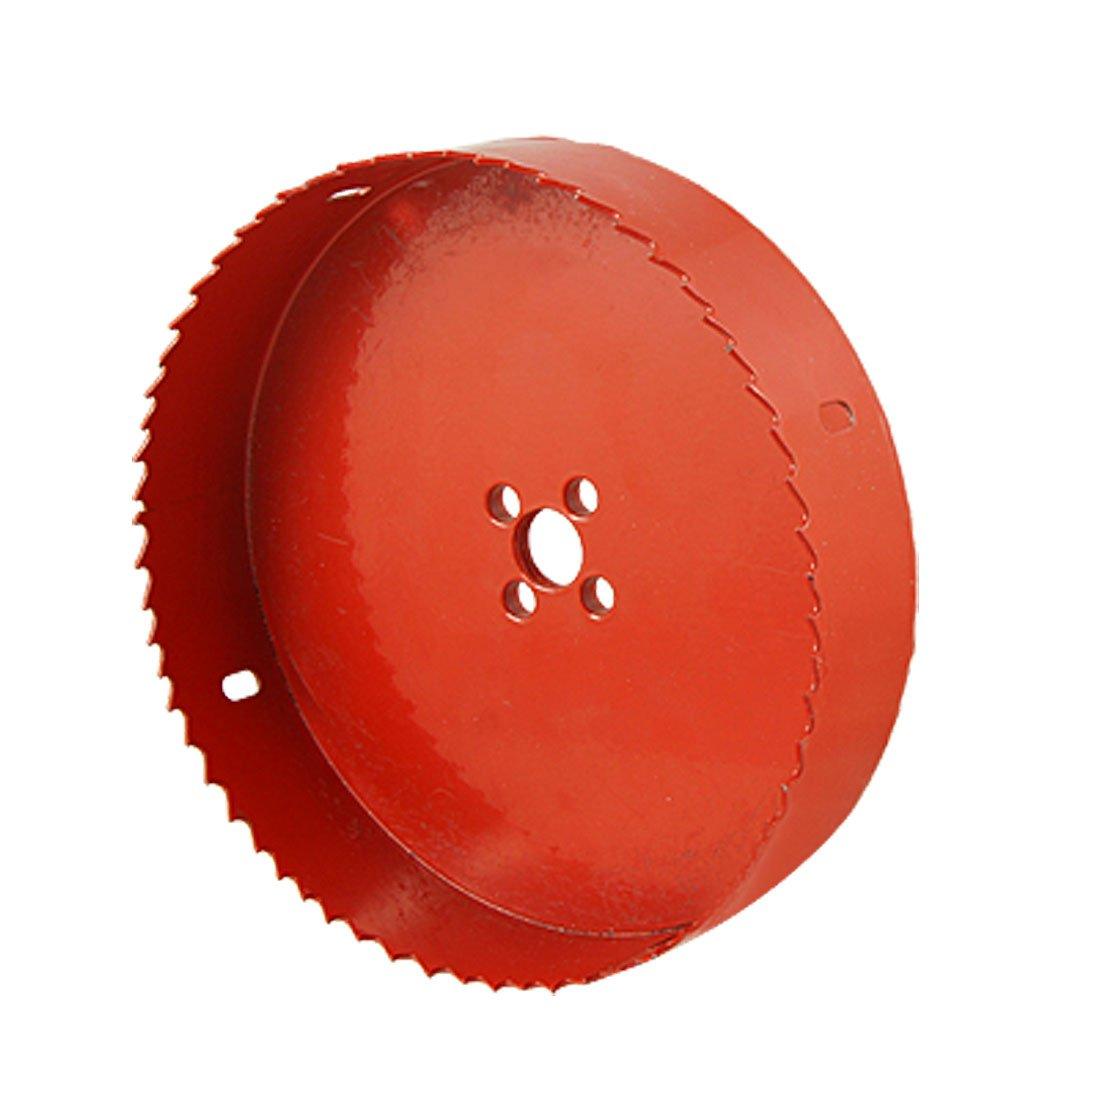 EWS 150mm Diameter Bimetal Hole Saw Wood Alloy Iron Cutter ews 25mm diameter hole saw cutter twist drill bit tool